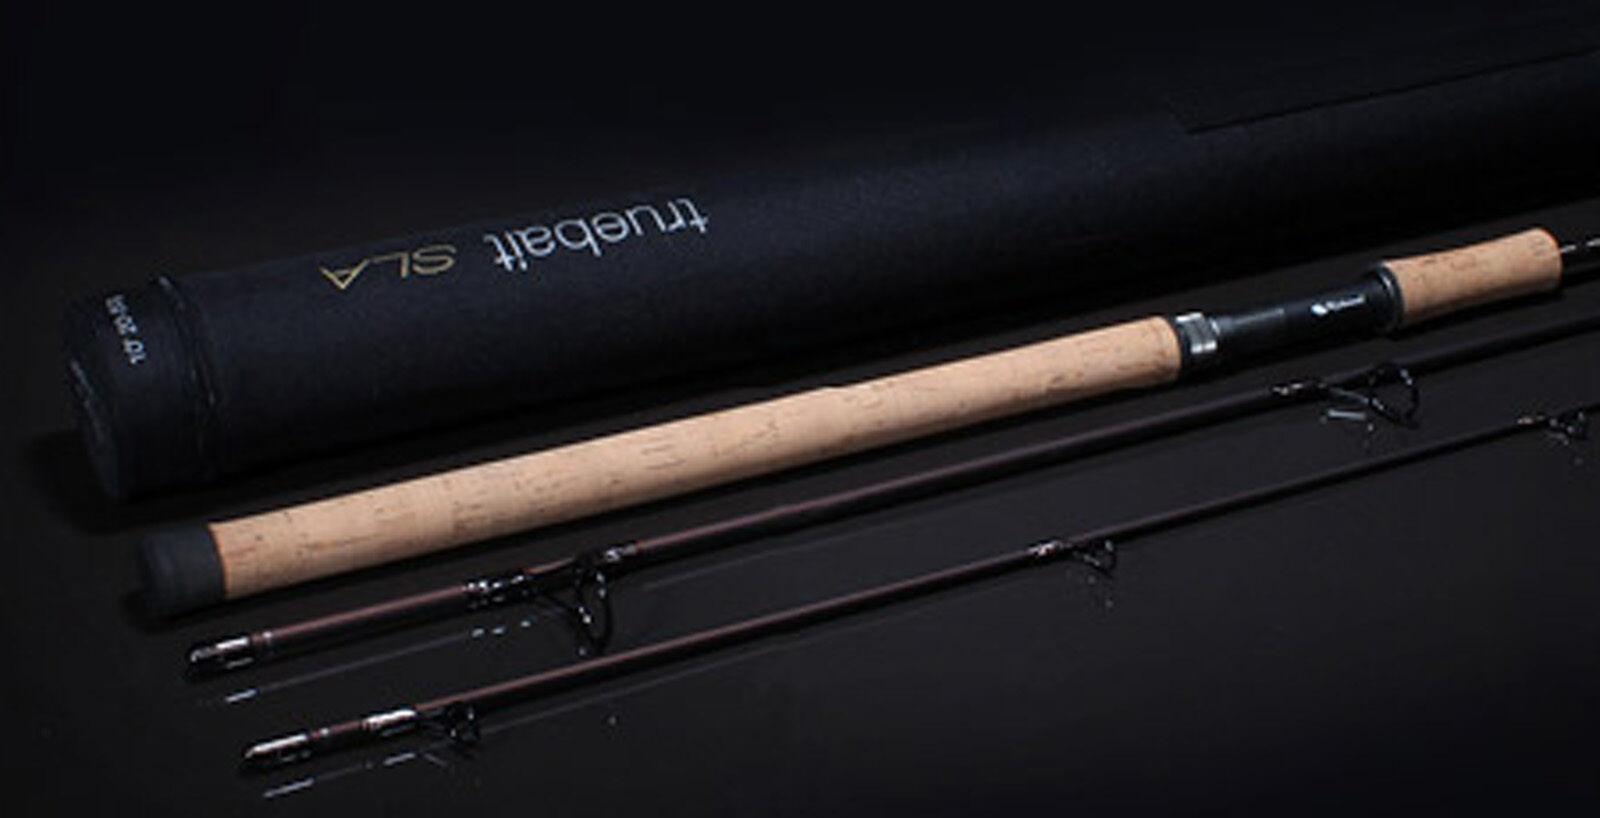 Wychwood Truebait SLA Salmon 3  Piece 11ft 12ft Fishing Rod With Cordura Tube  save up to 70%